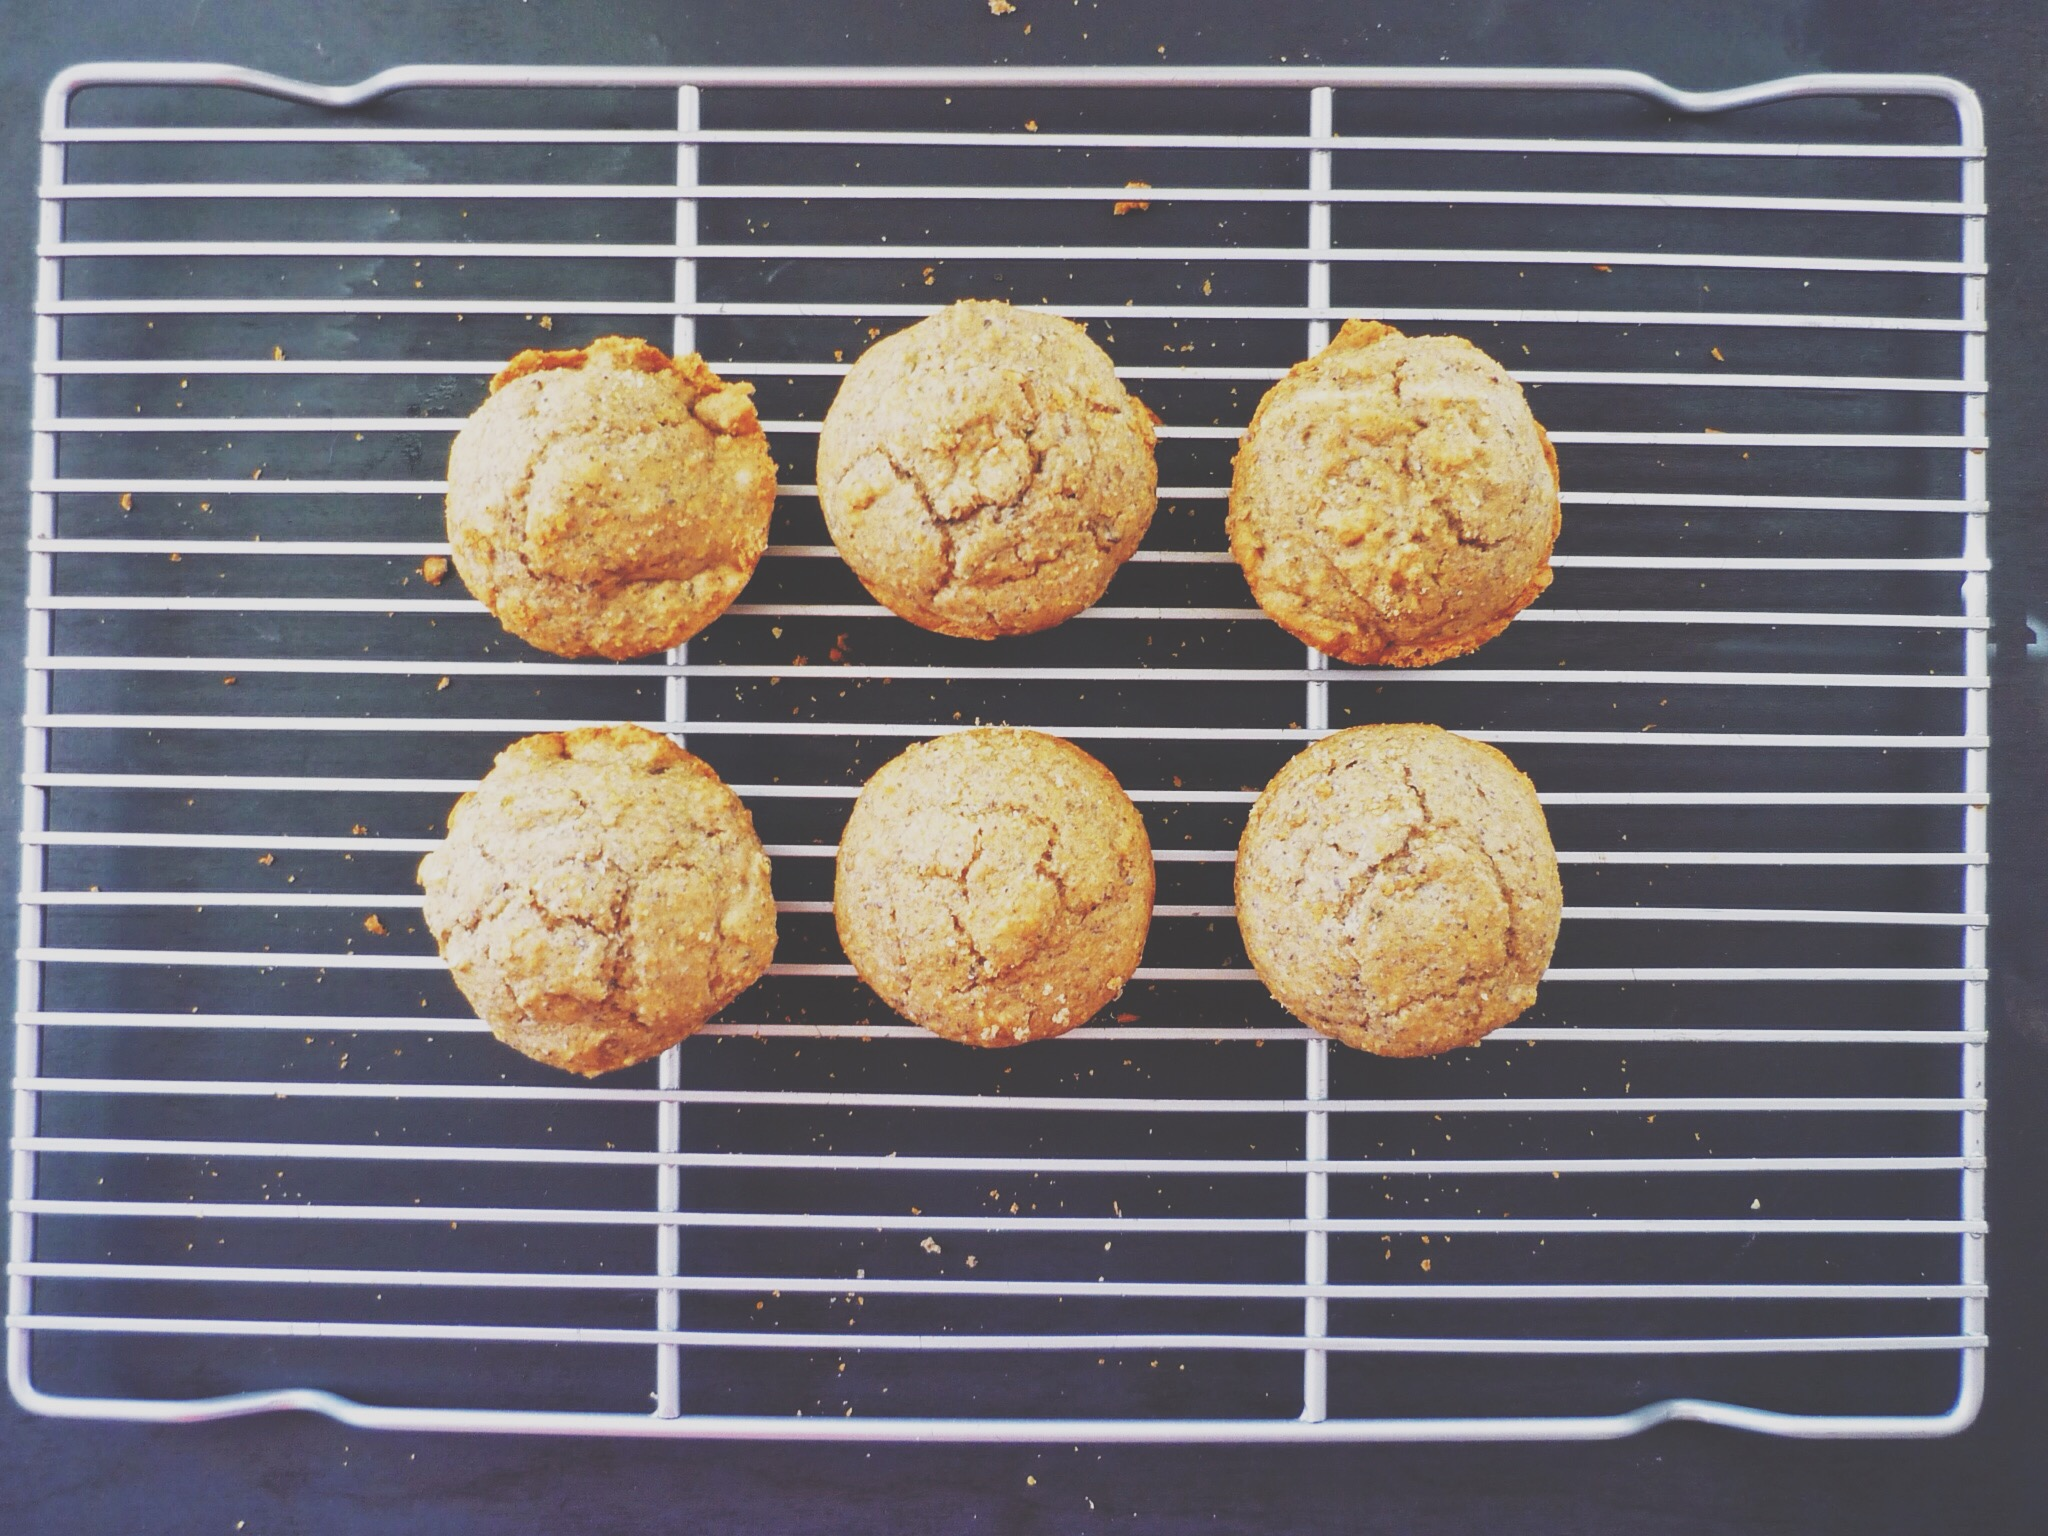 Rosemary-Thyme Cornbread Muffins